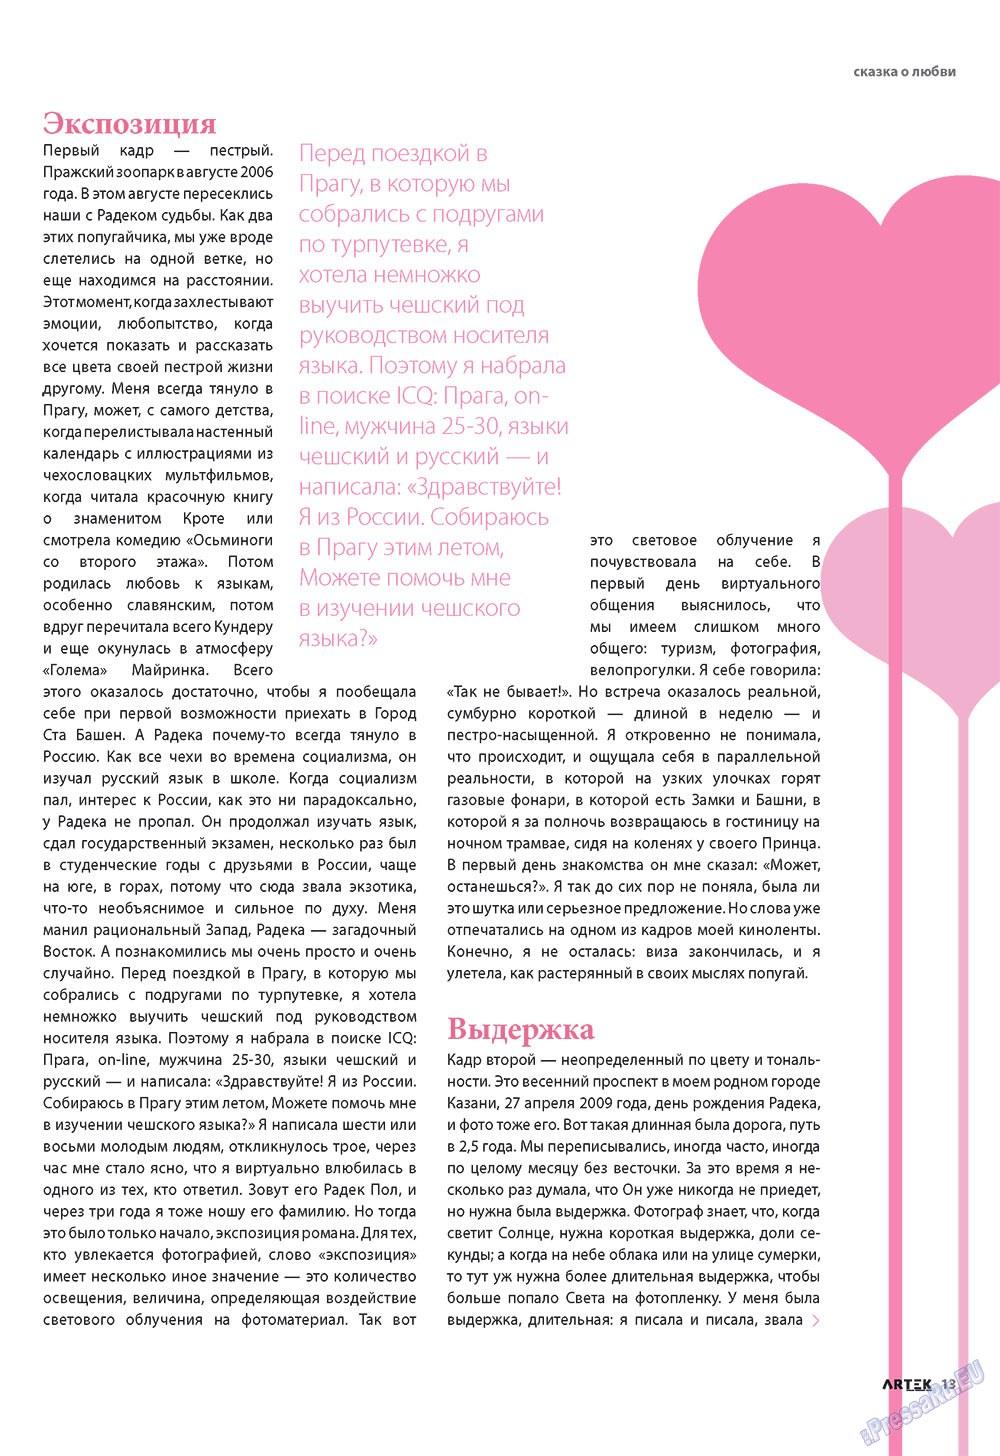 Артек (журнал). 2009 год, номер 6, стр. 15